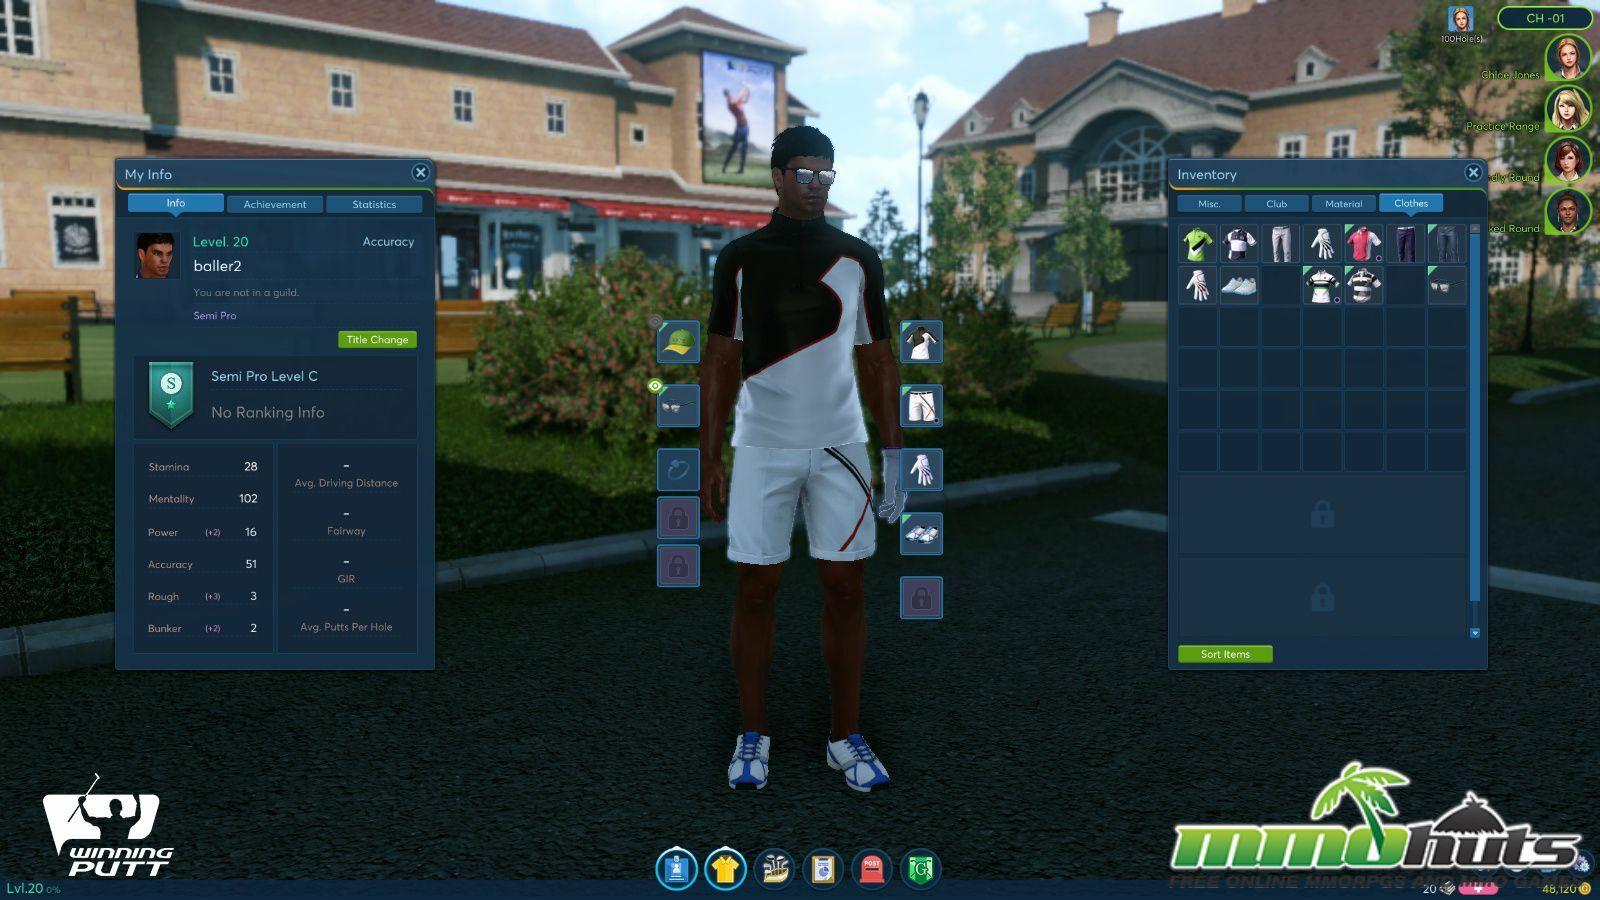 Winning Putt Preview Screenshot 08 Gameplay Nice Shot